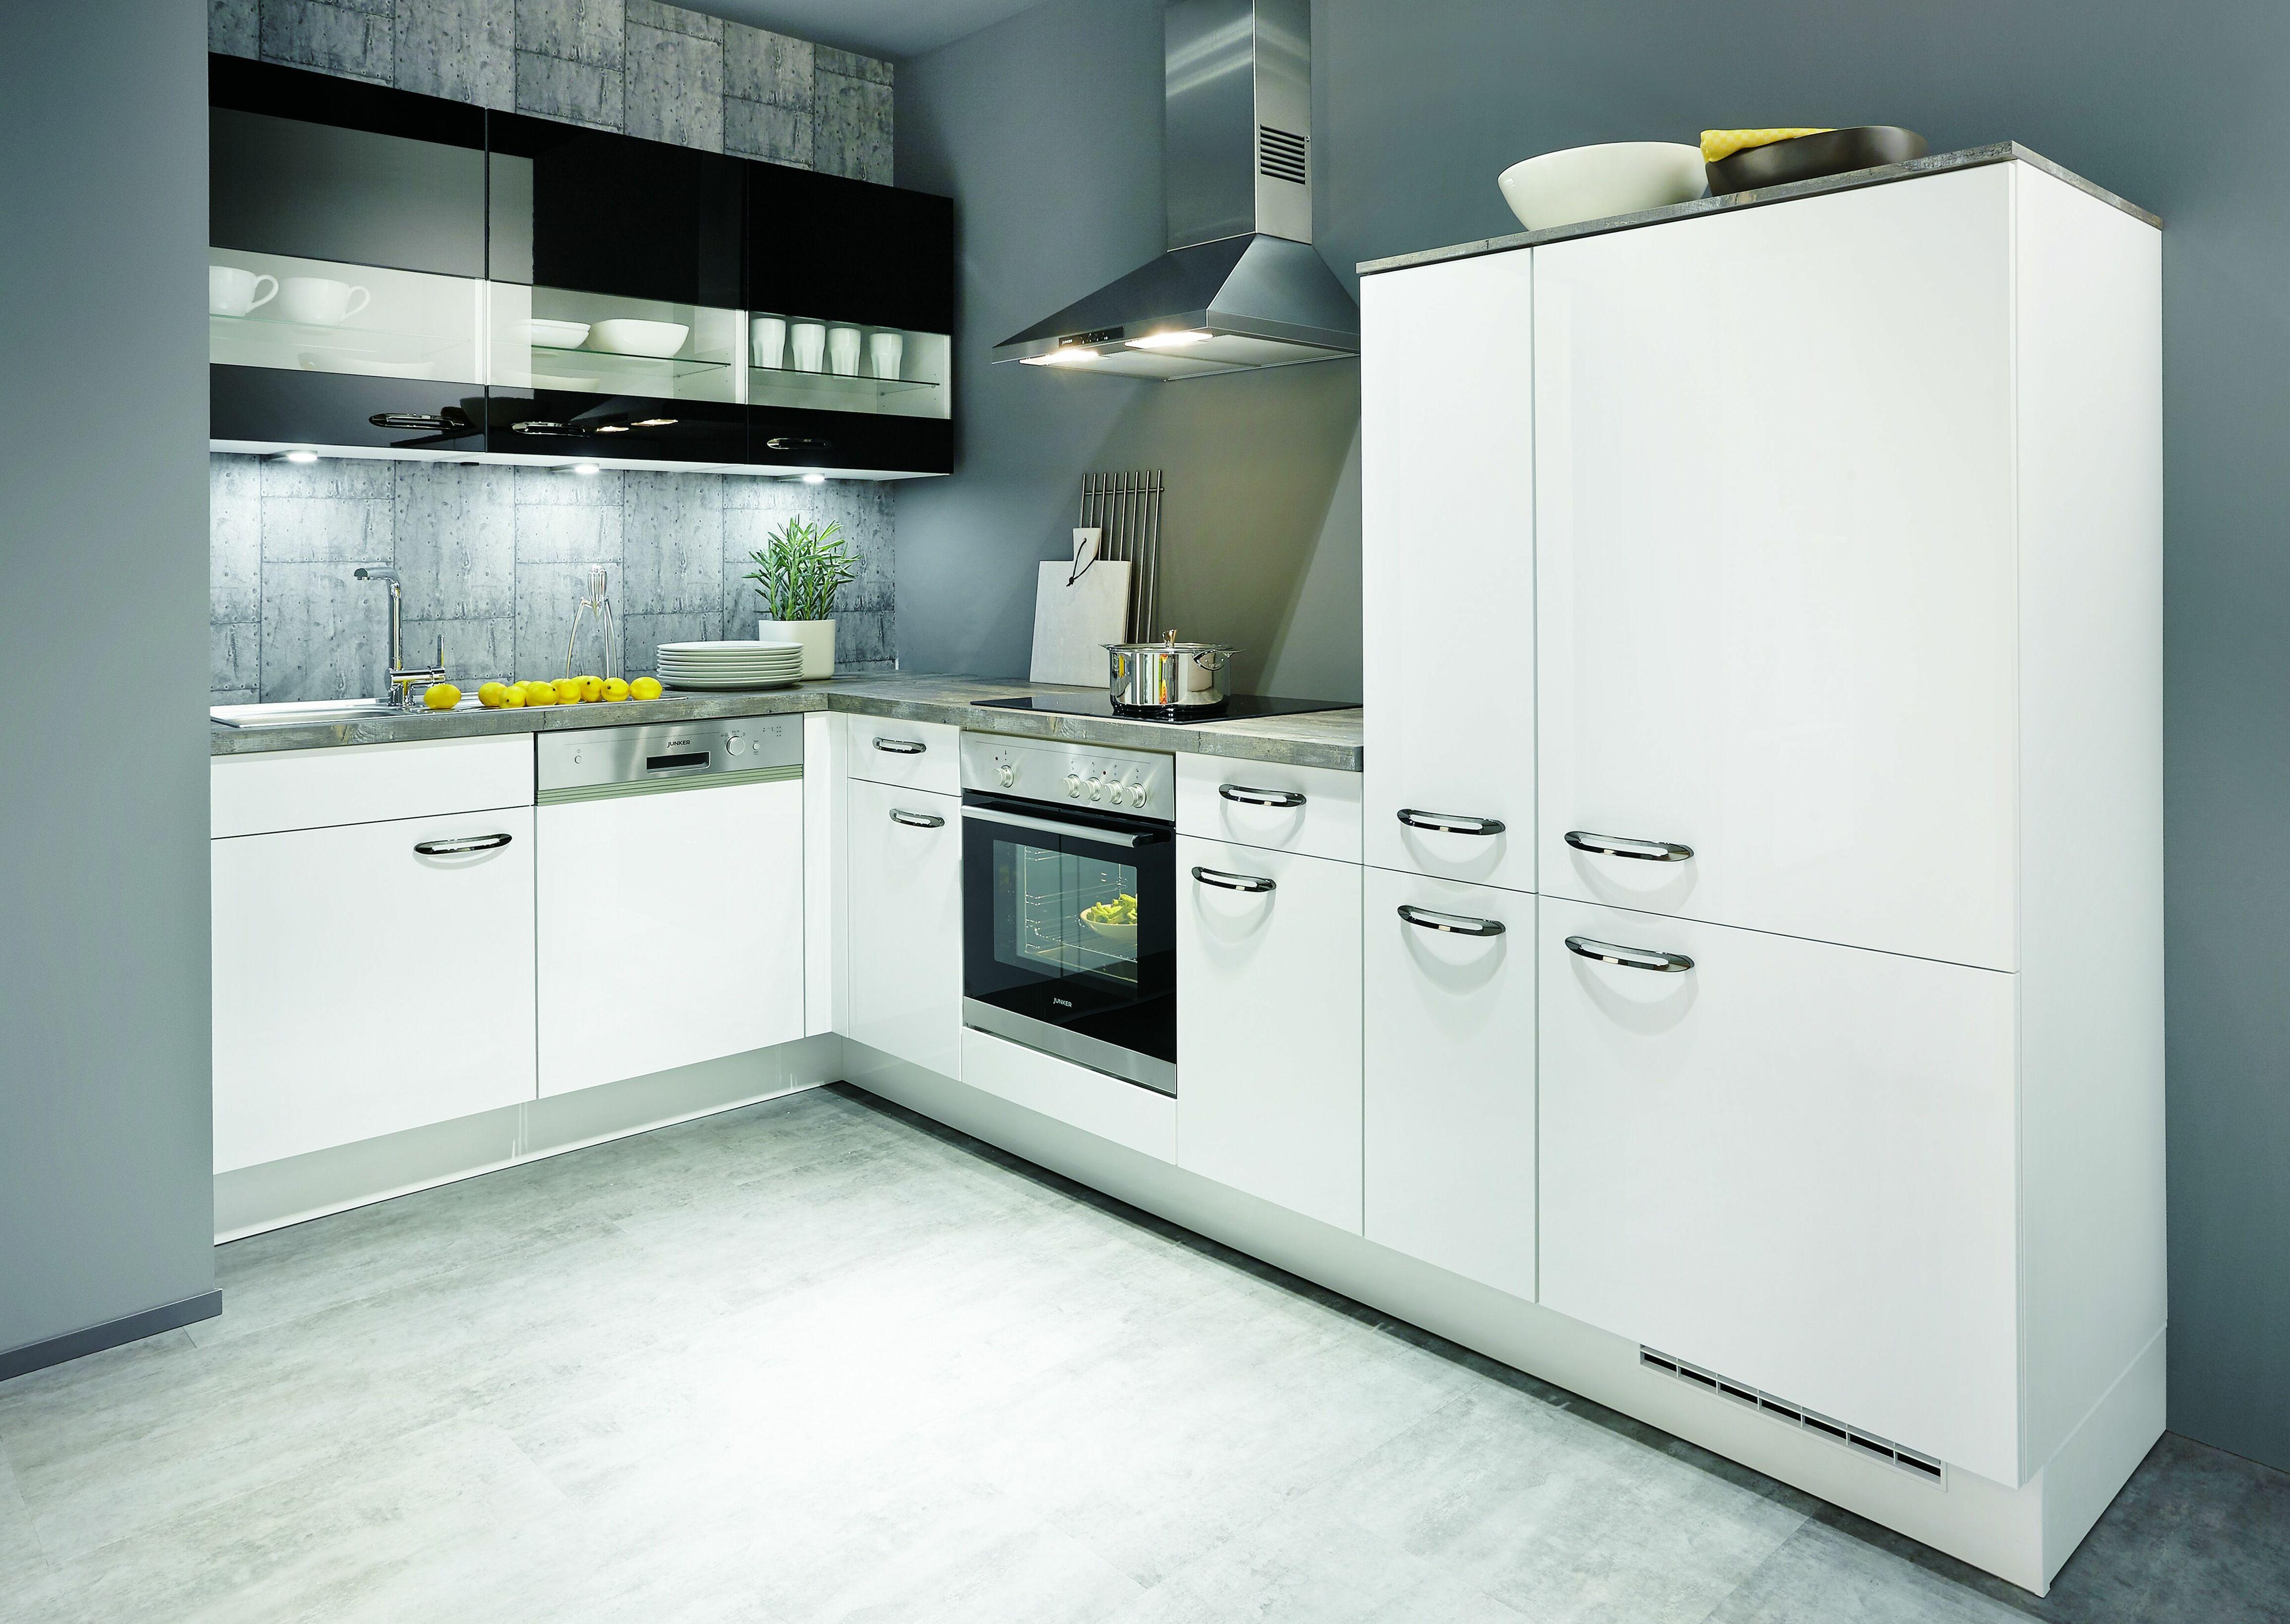 eckk che inkl ger te online ausw hlen kaufen oder beraten lassen. Black Bedroom Furniture Sets. Home Design Ideas